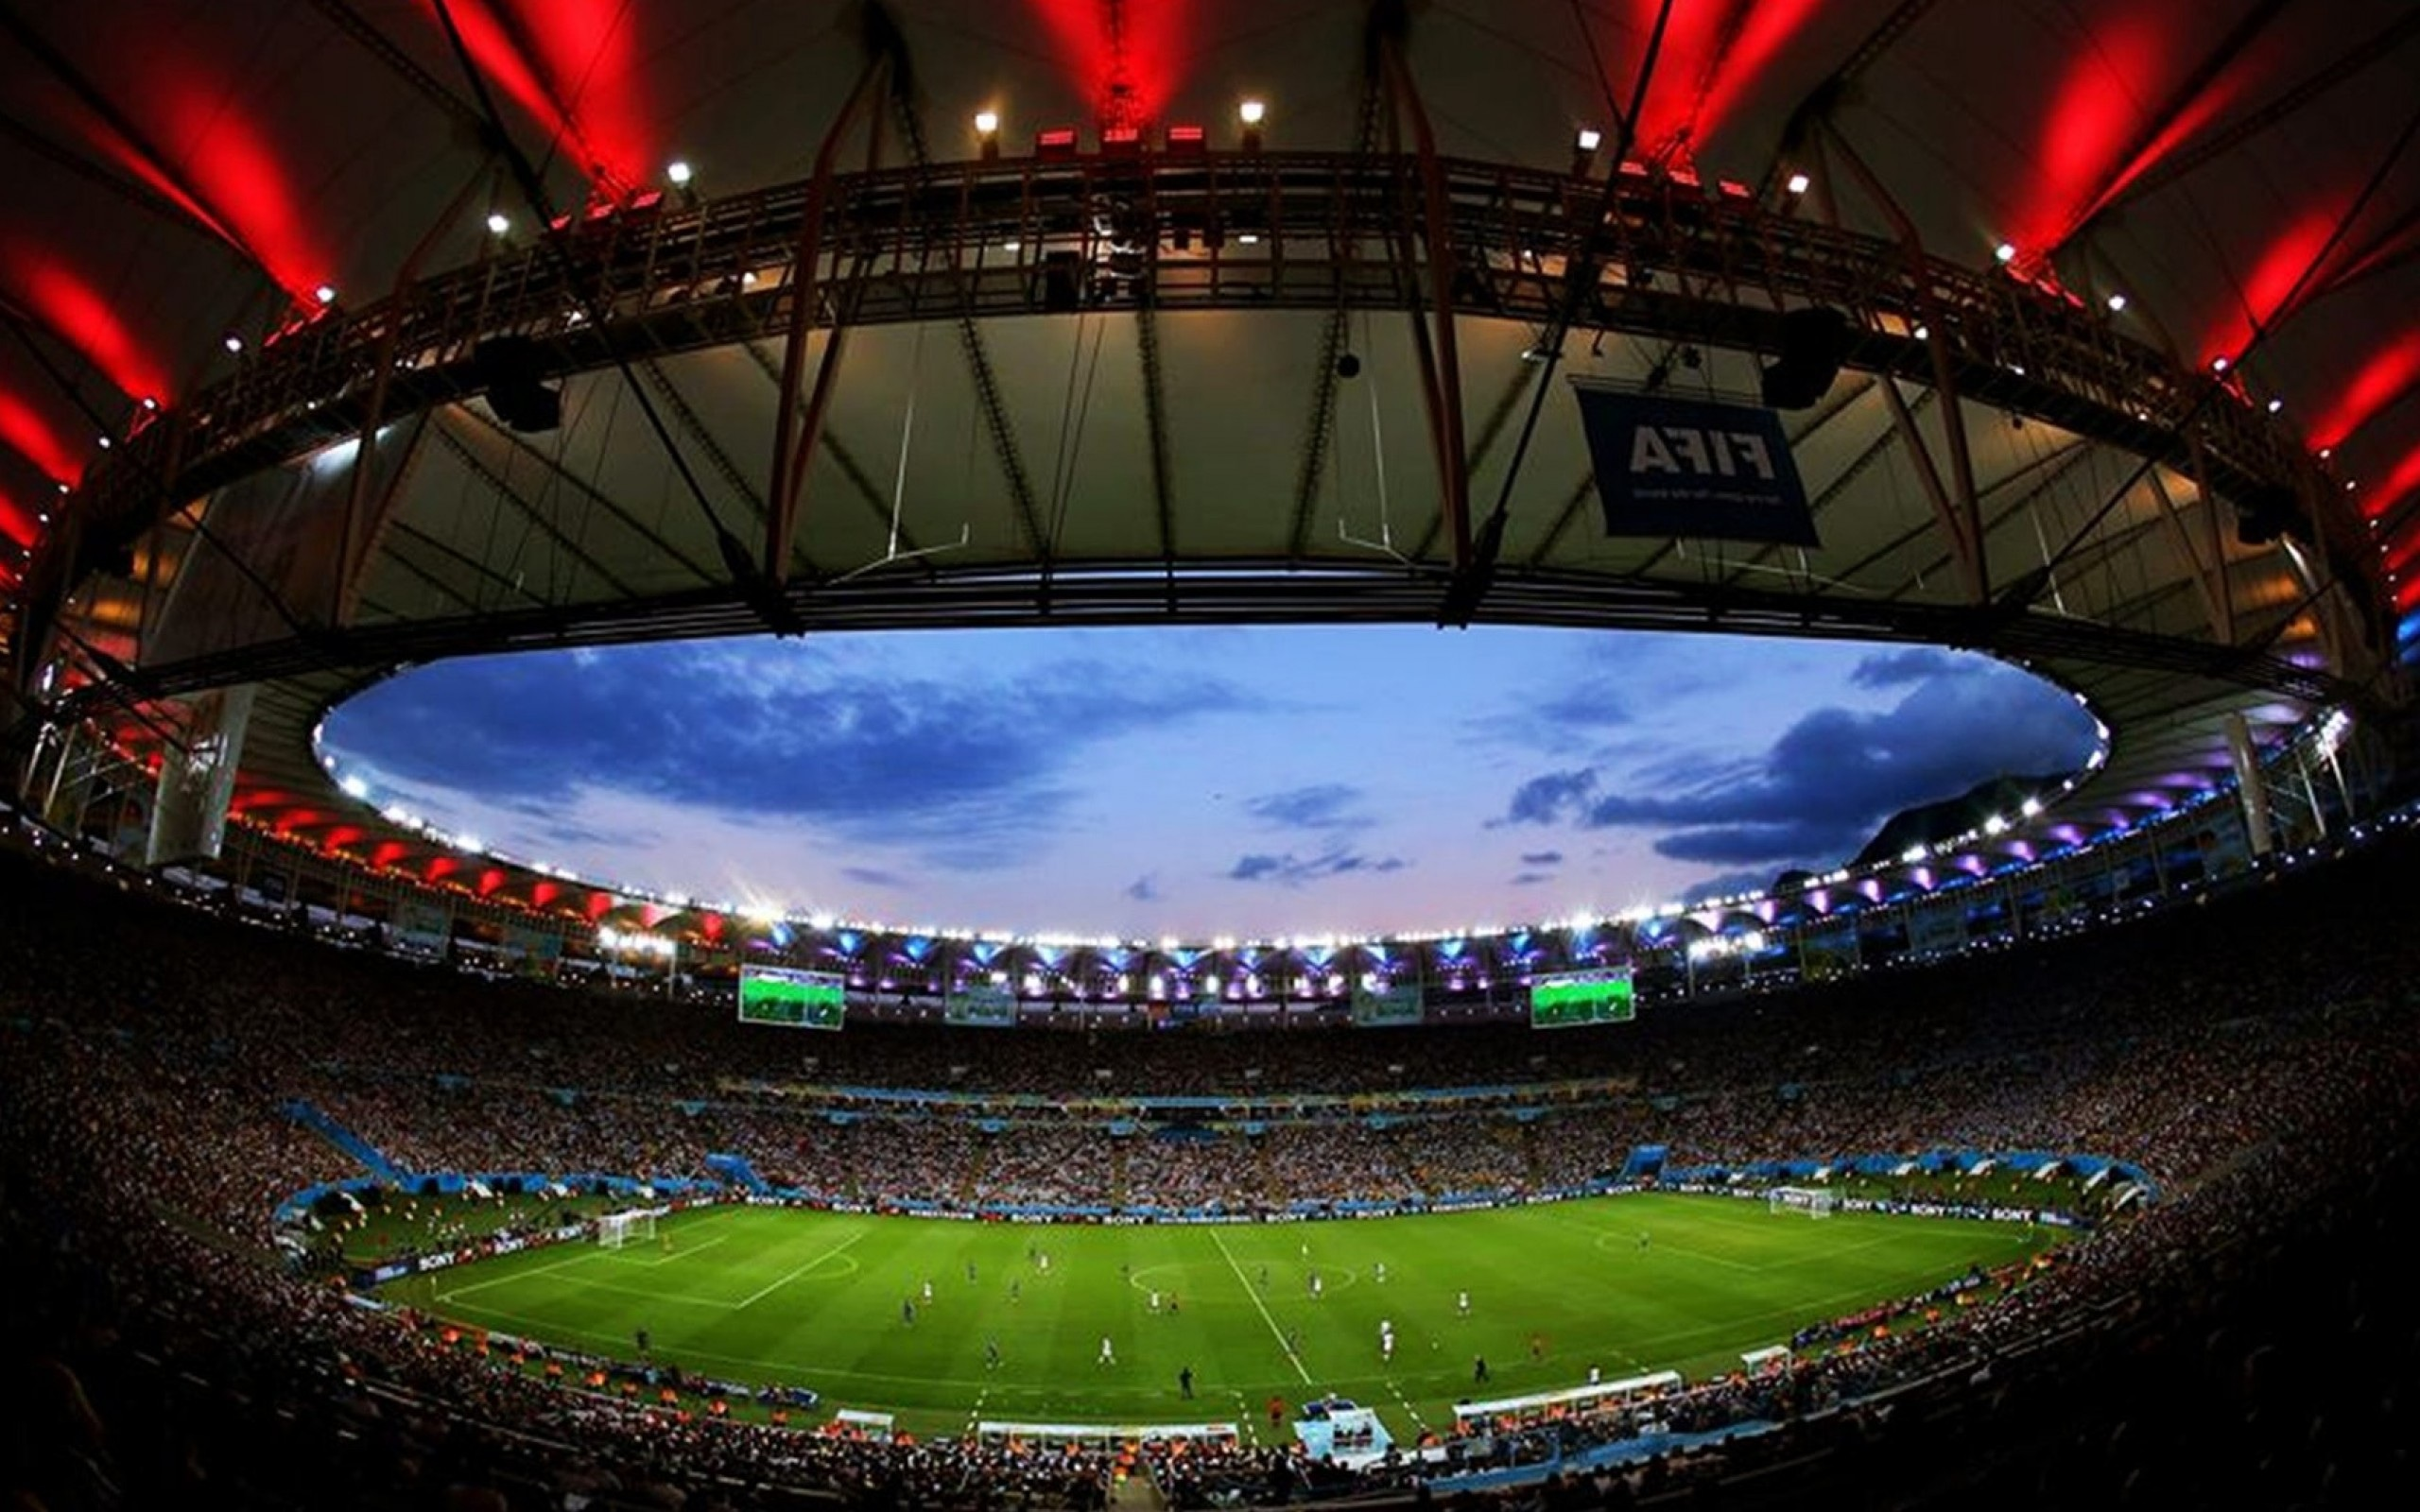 Football stadium hd wallpapers - Soccer stadium hd ...